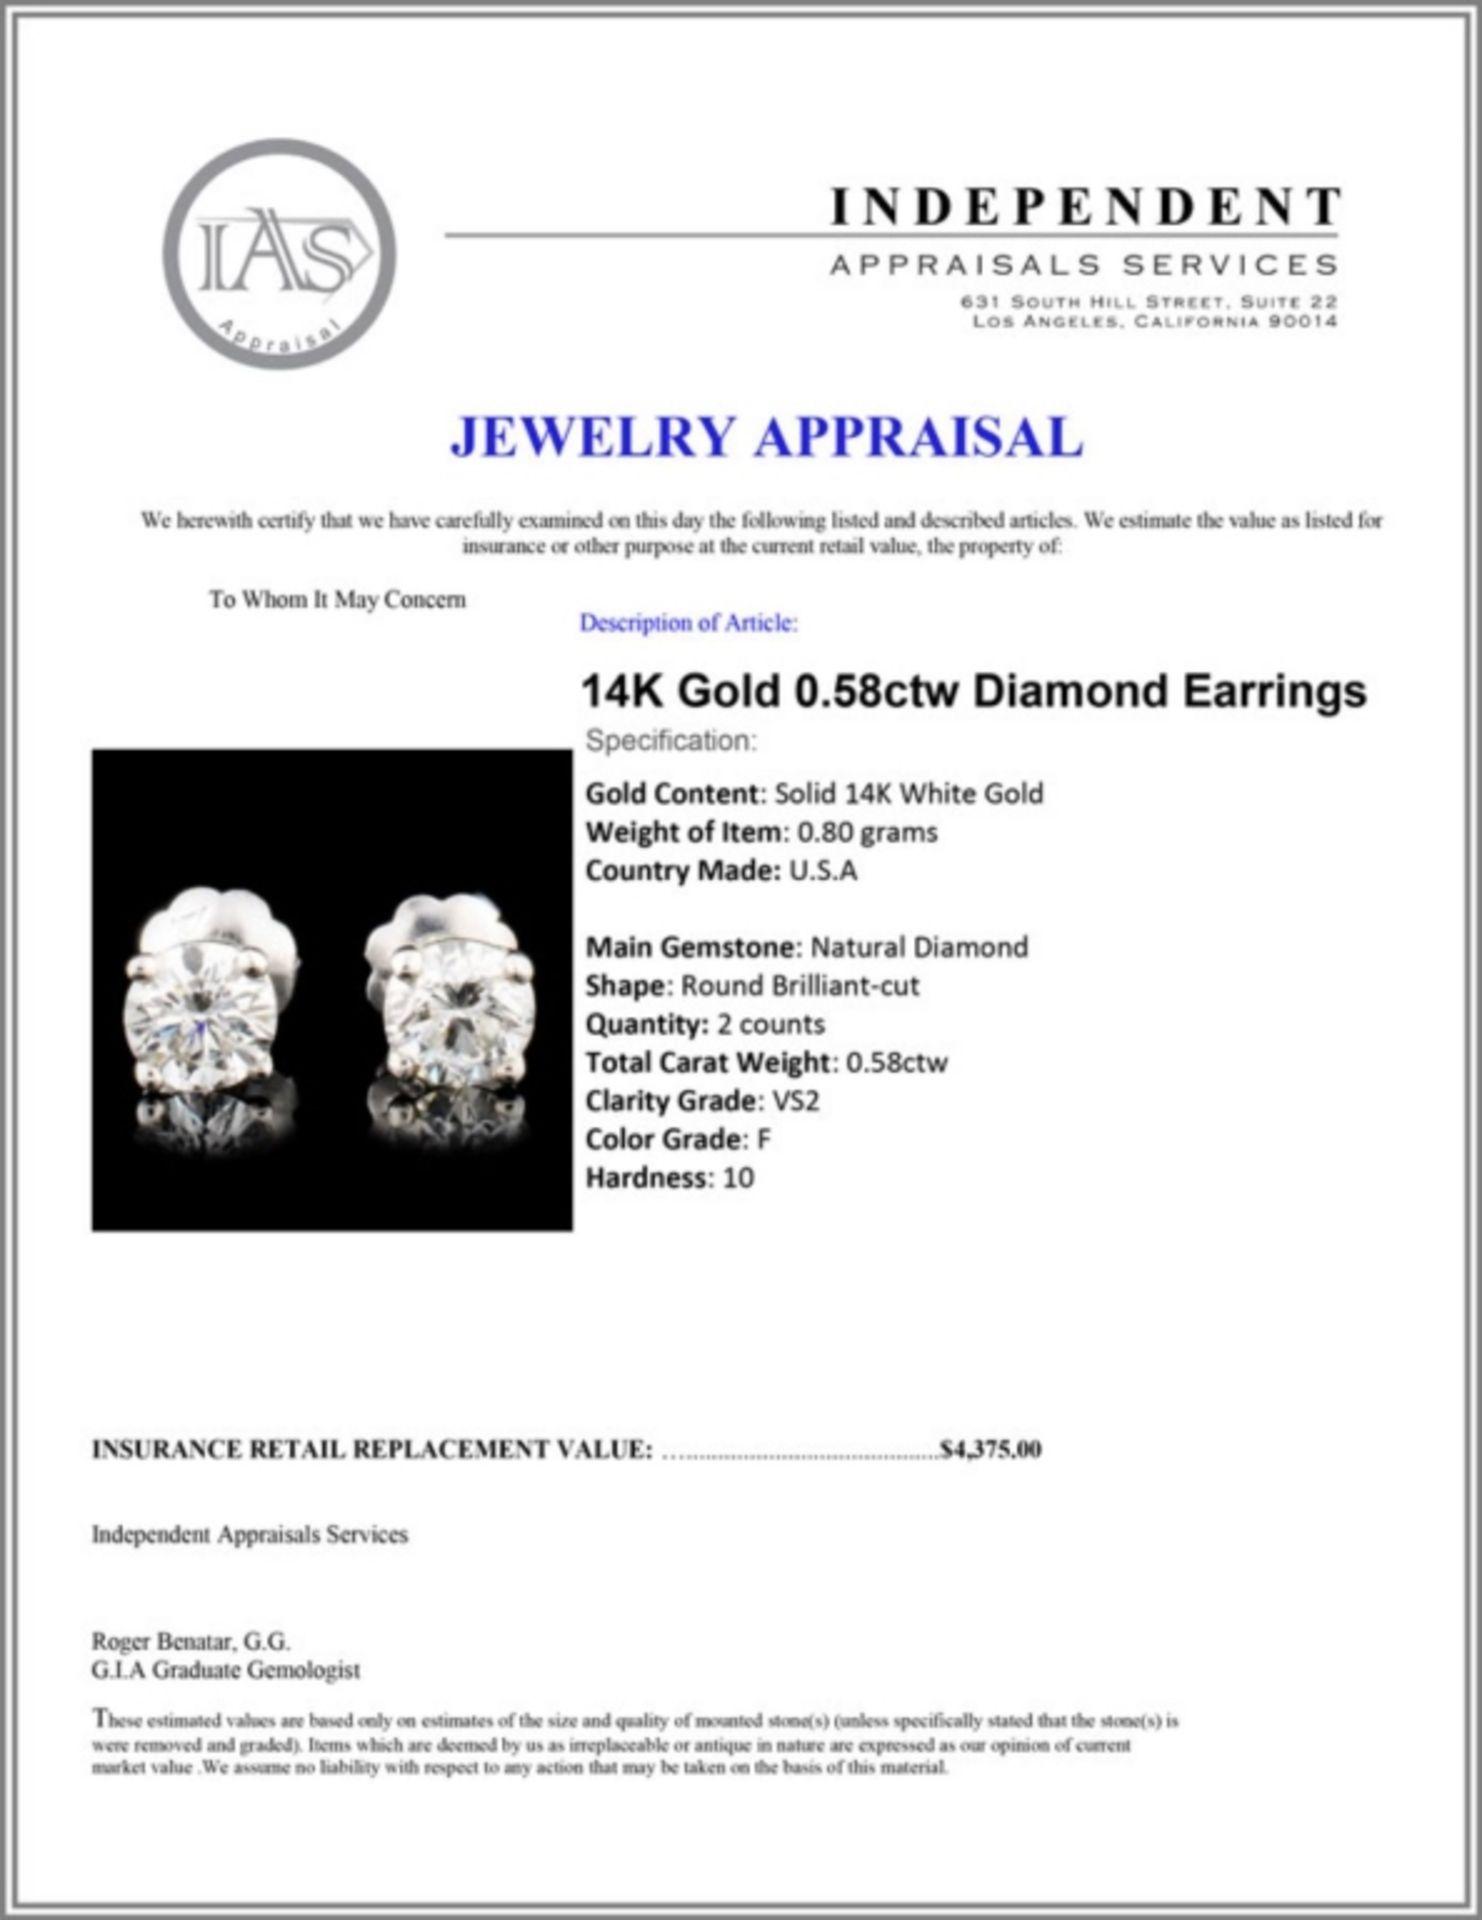 14K Gold 0.58ctw Diamond Earrings - Image 3 of 3